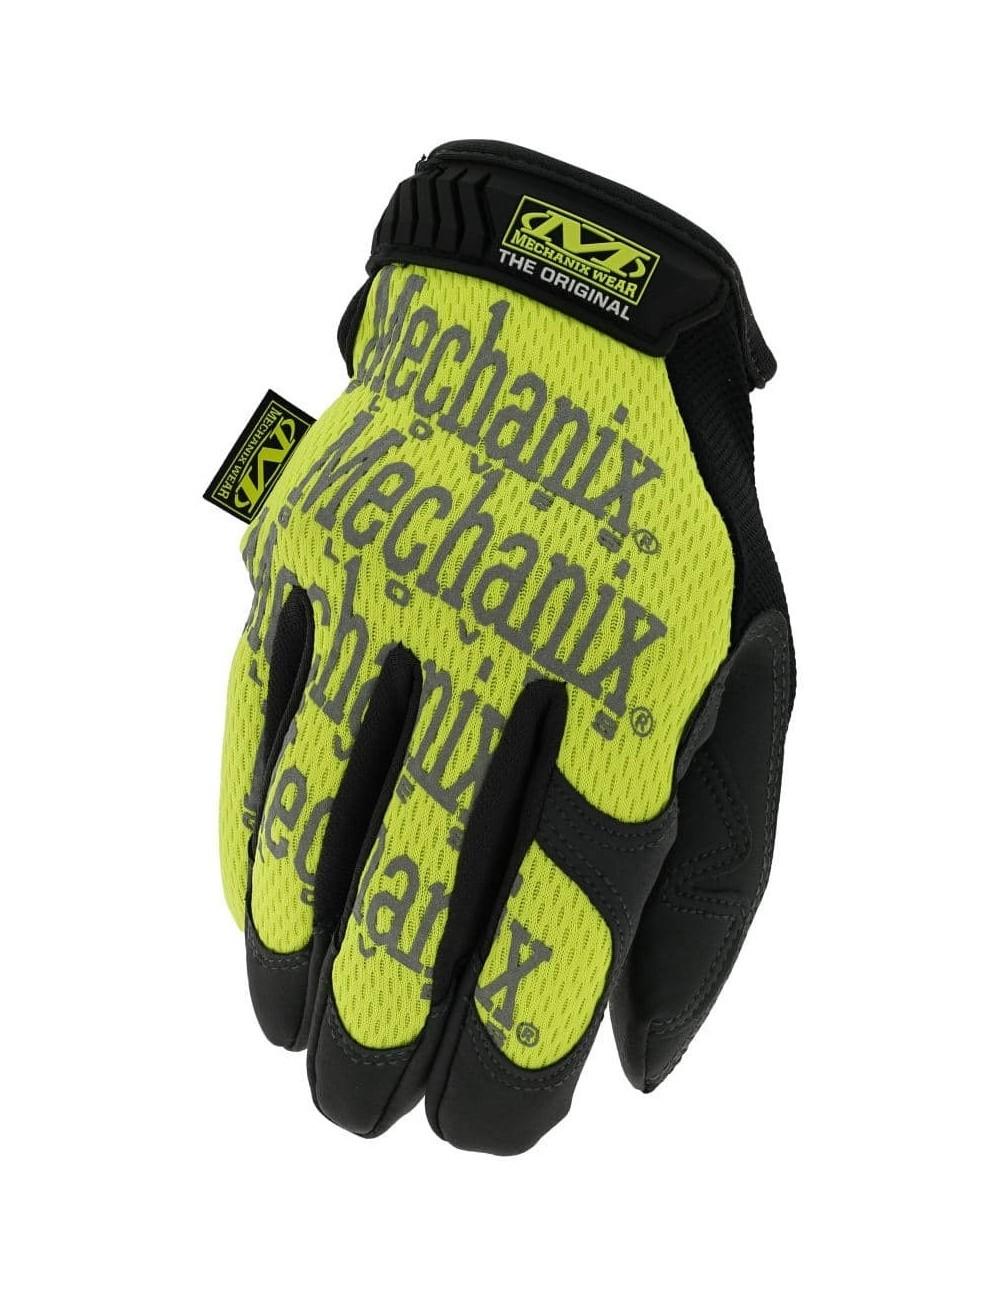 Rękawice Mechanix Hi-viz Original®